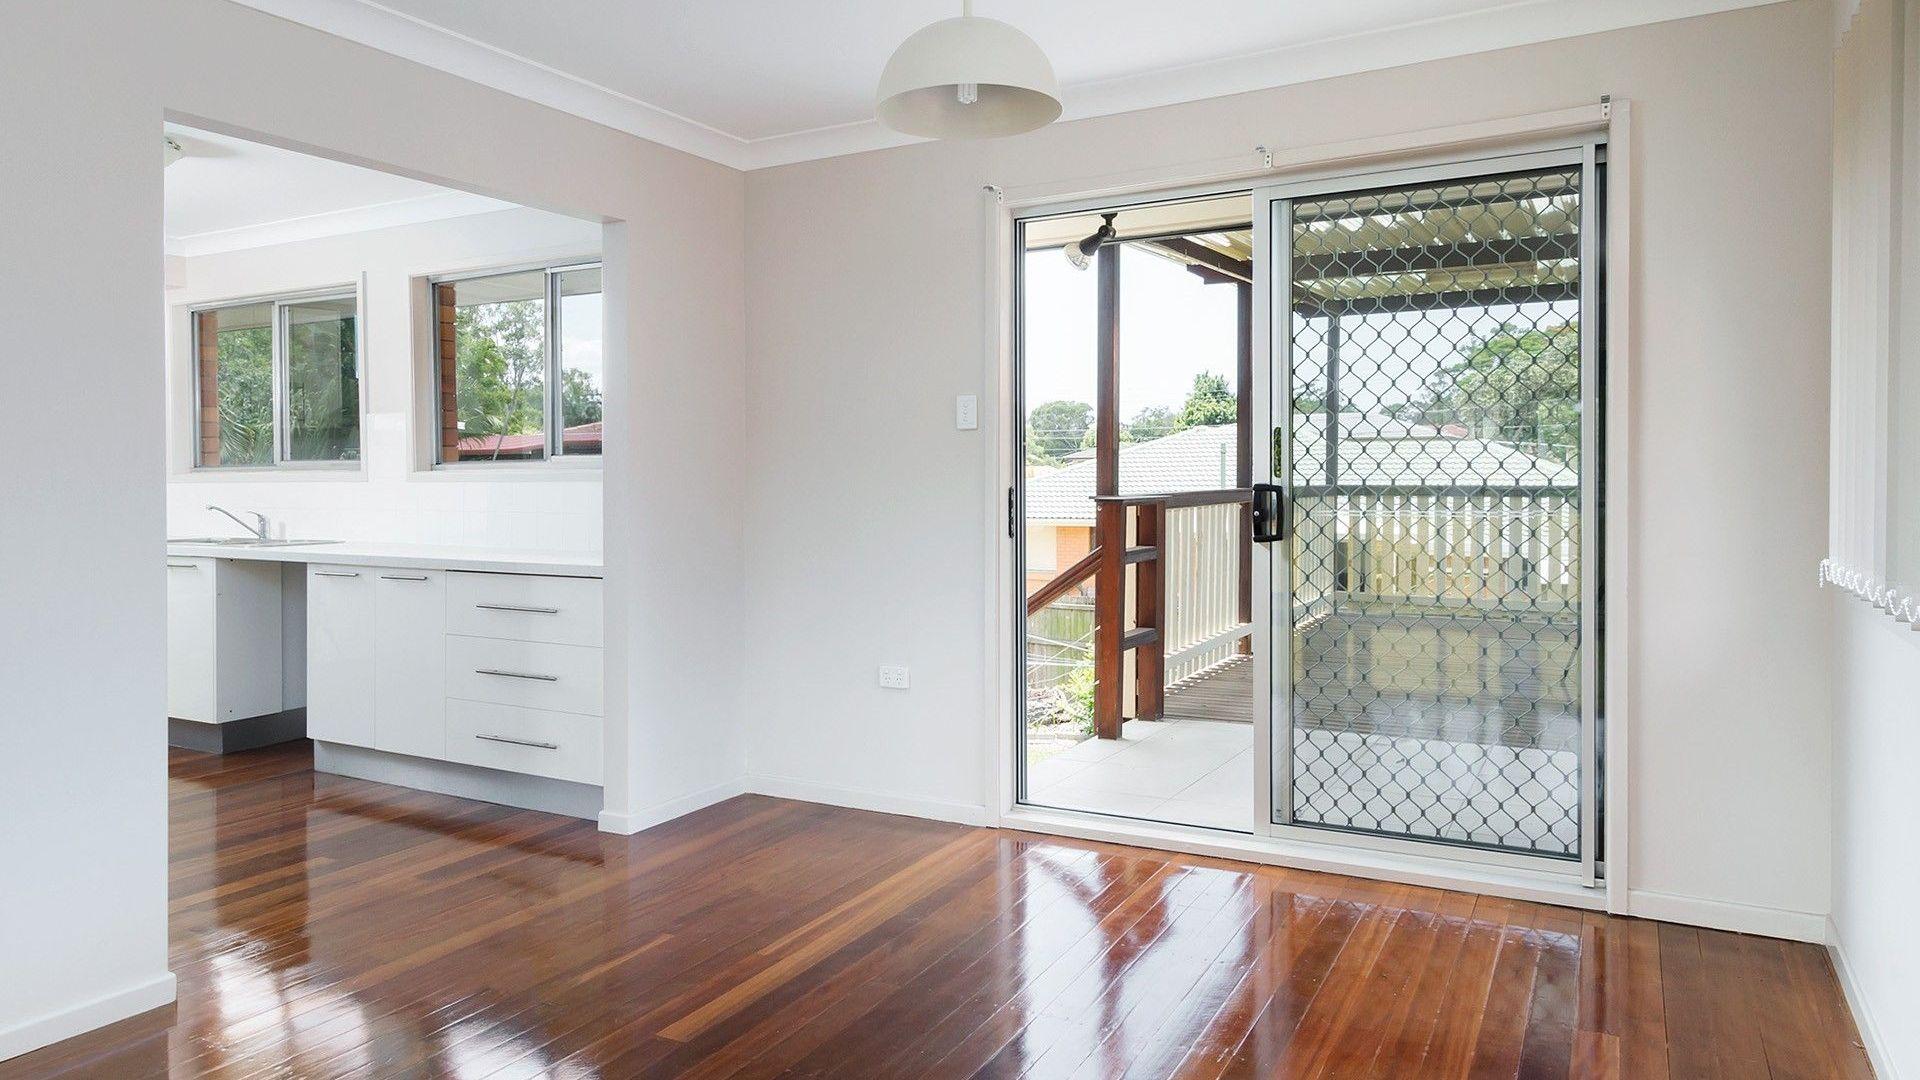 12 Lorrimore Street, Macgregor QLD 4109, Image 2